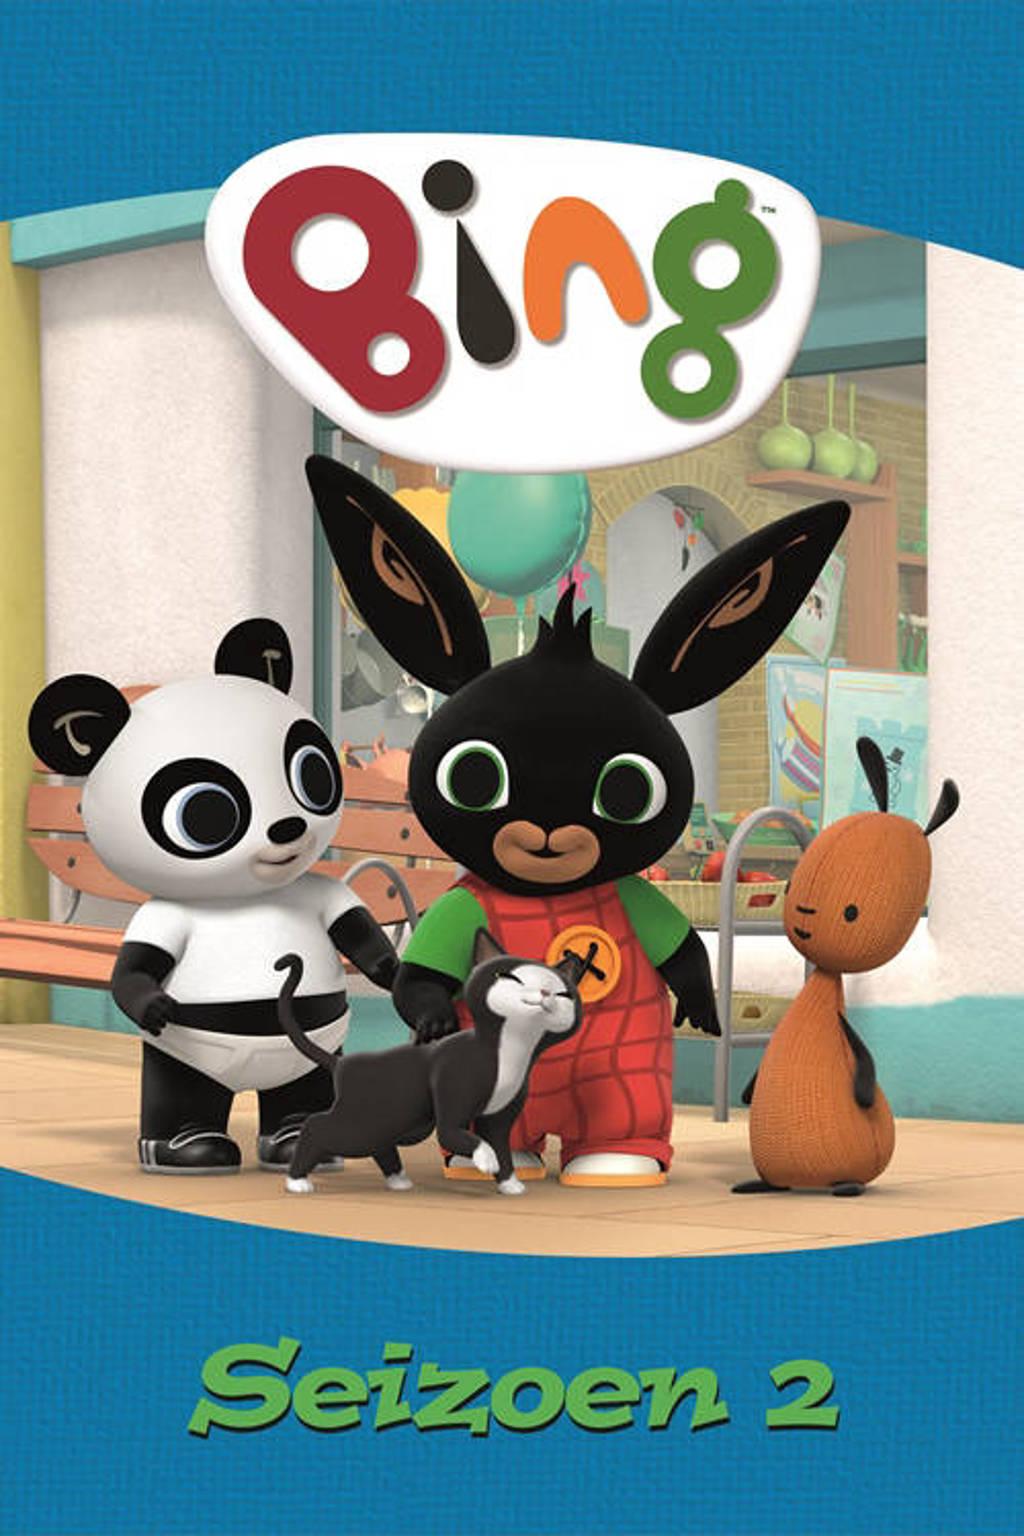 Bing - Seizoen 2 (DVD)